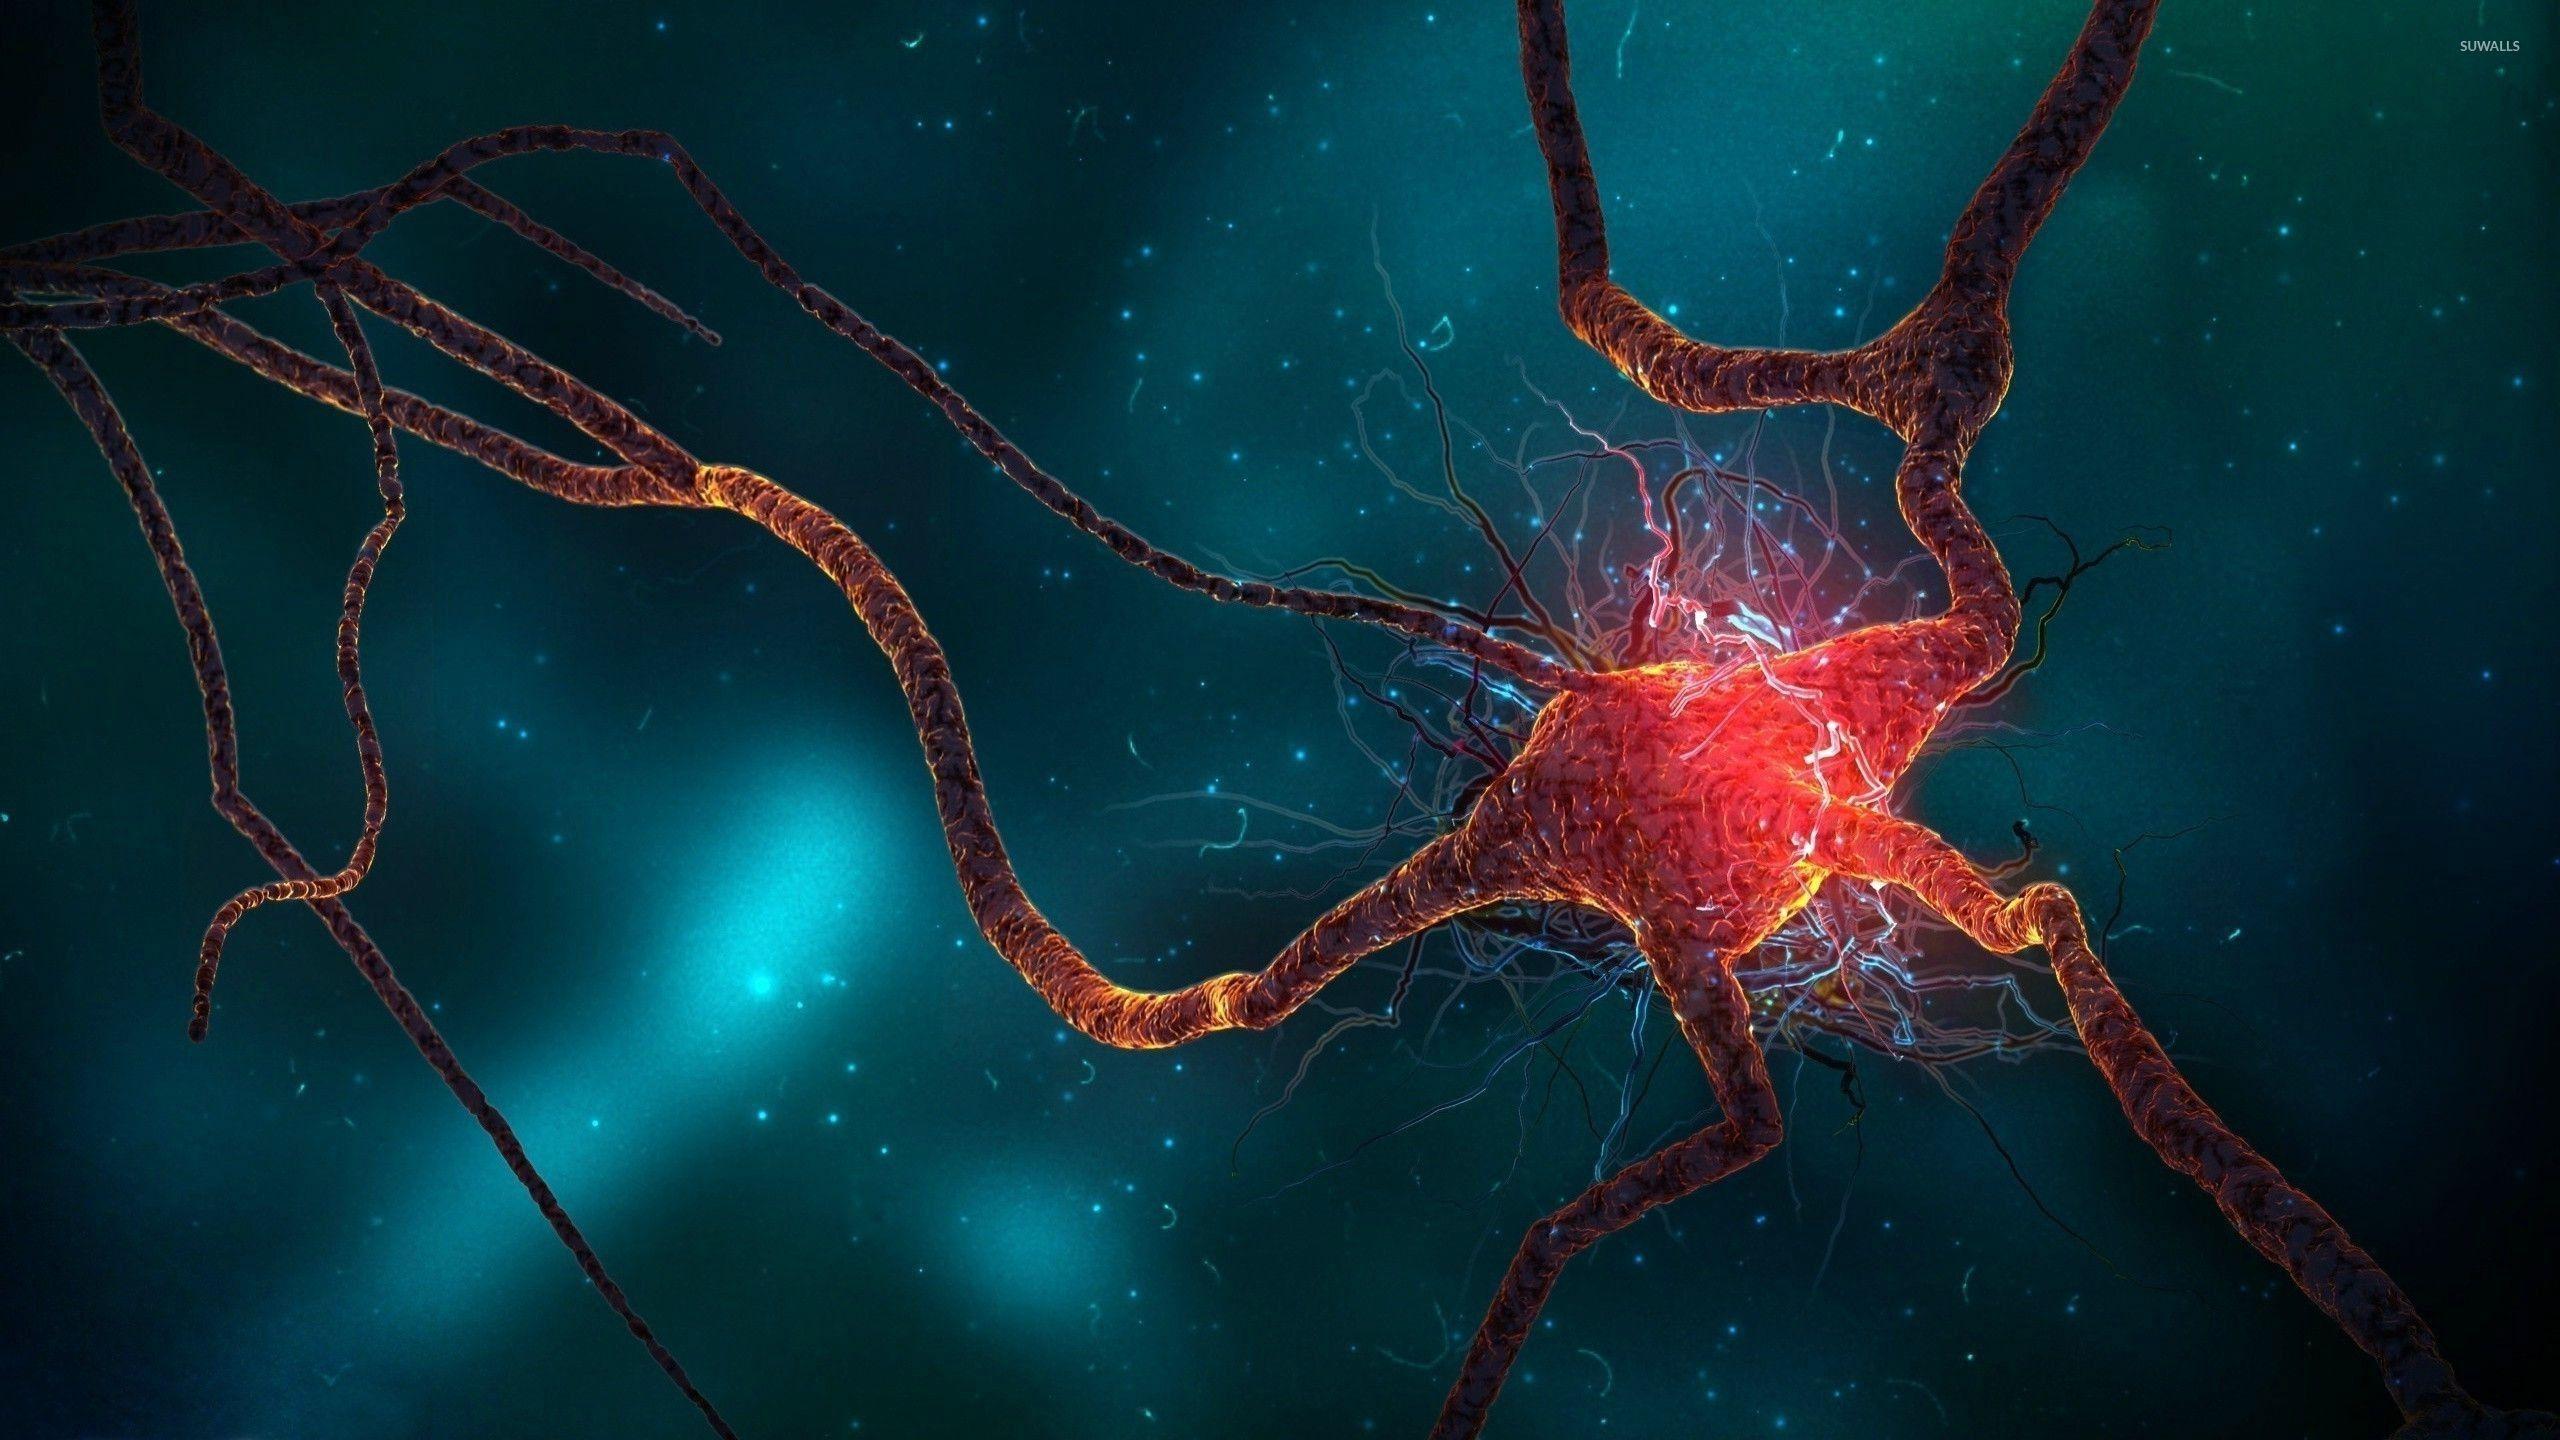 Biology Wallpapers - Top Free Biology